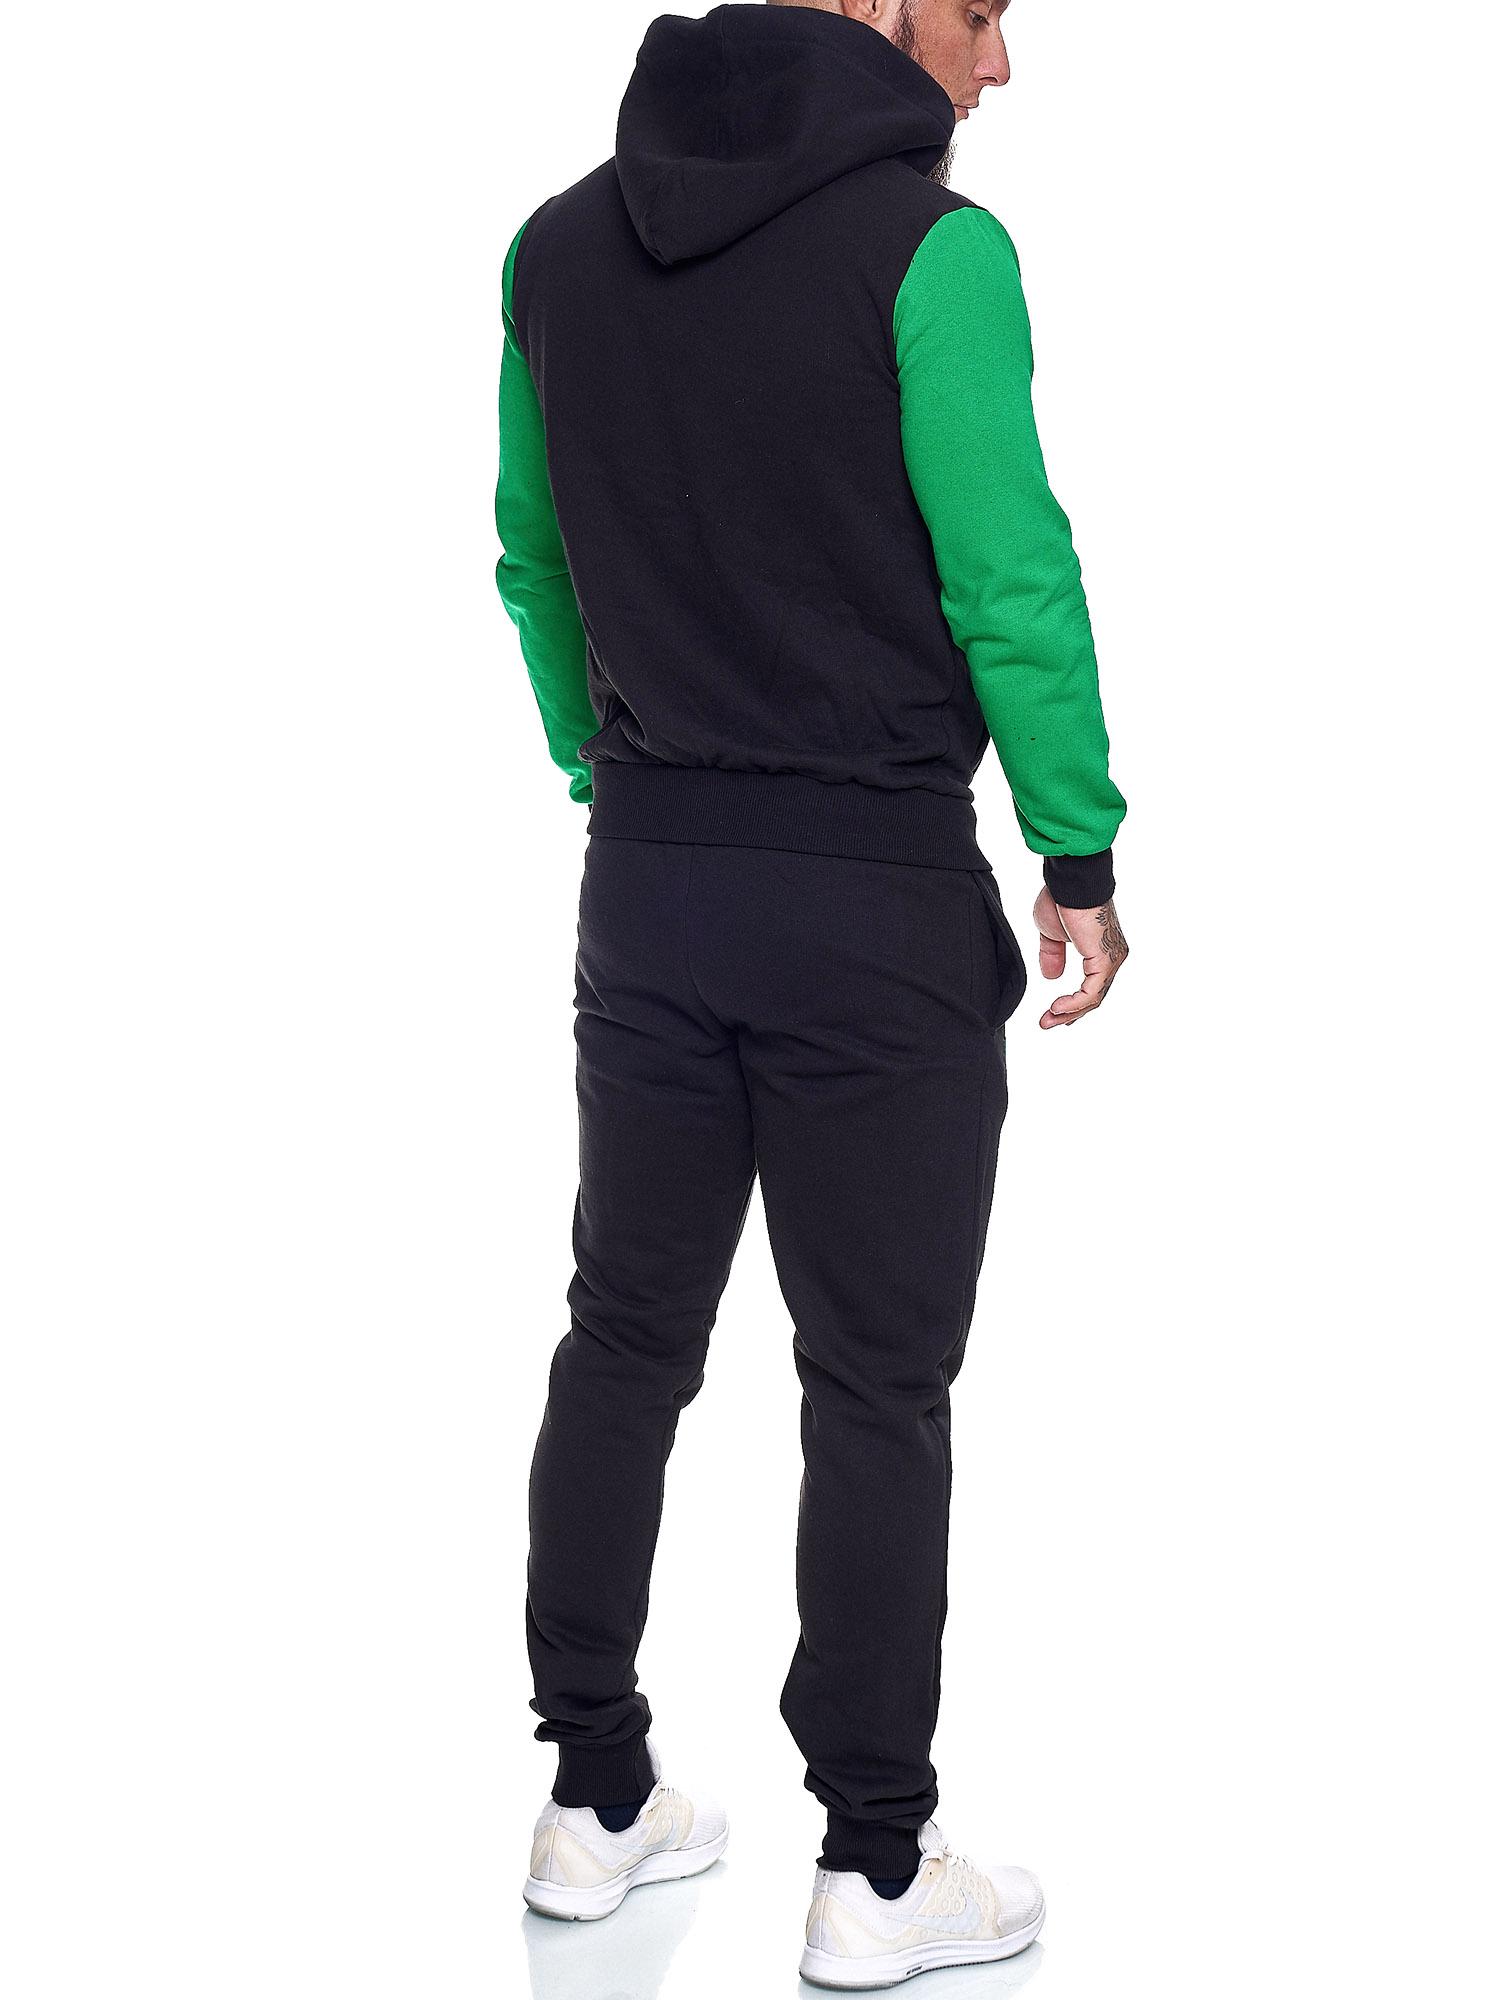 Damen-Jogginganzug-Frauen-Trainingsanzug-Sportanzug-Streetwear-JG-512-John-Kayna Indexbild 27